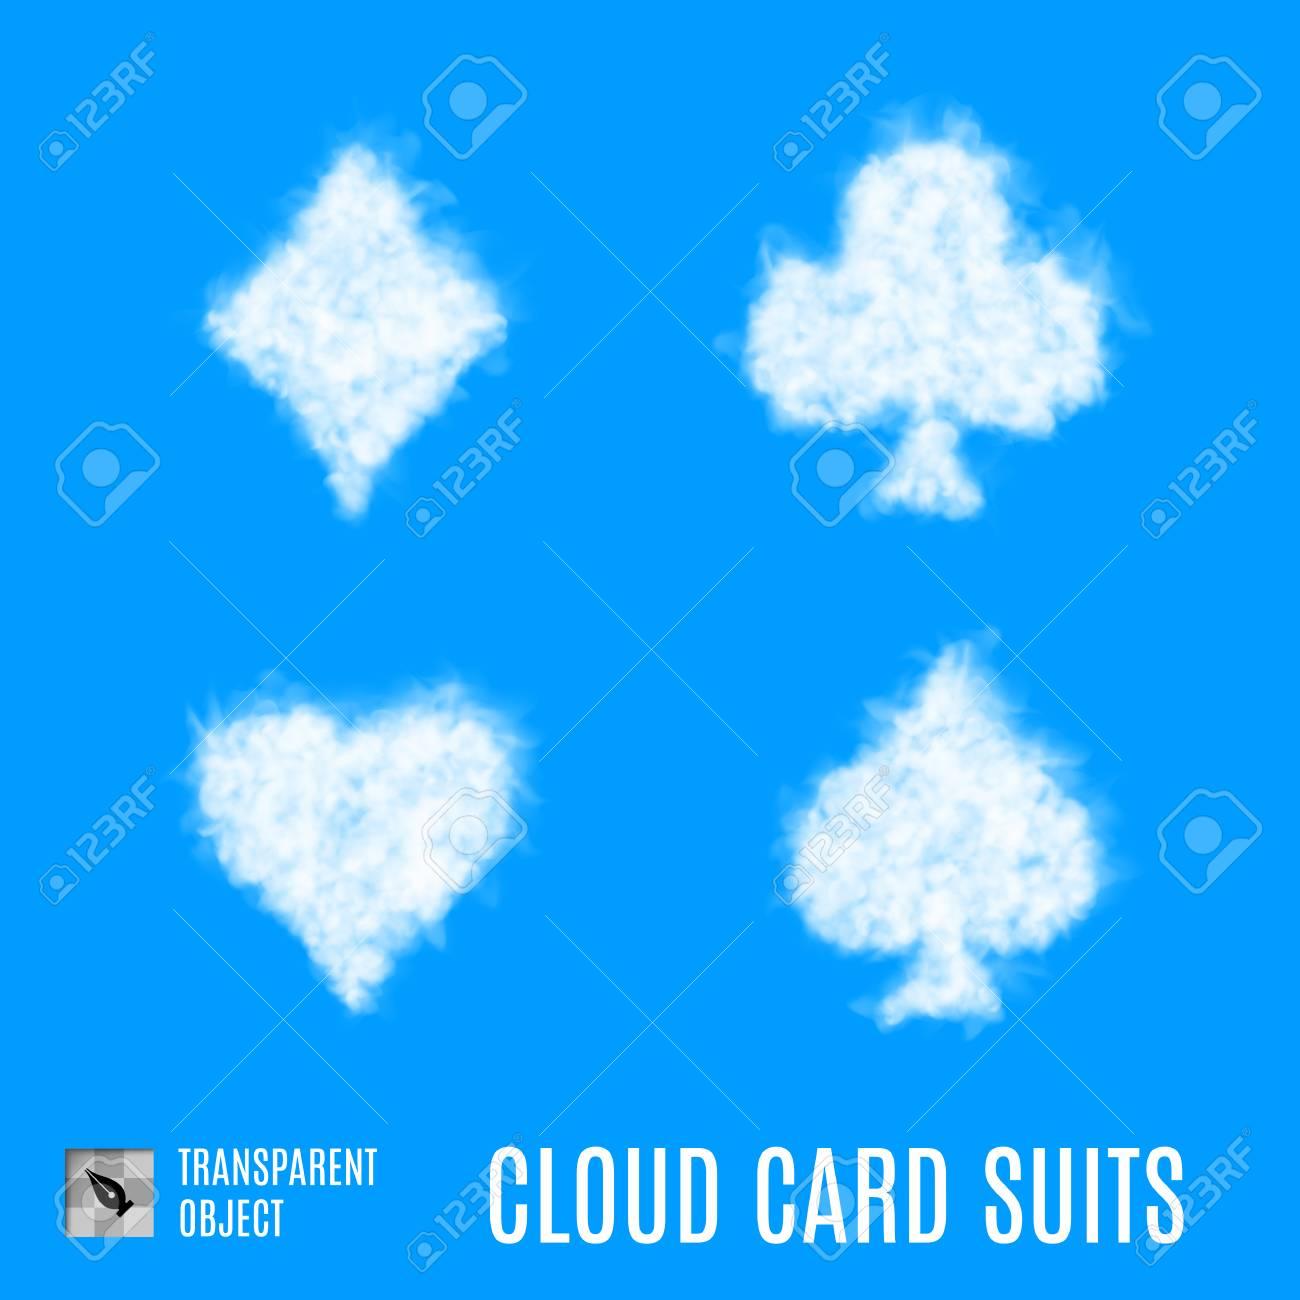 White cloud shape like set of playing card symbols royalty free white cloud shape like set of playing card symbols stock vector 78935960 biocorpaavc